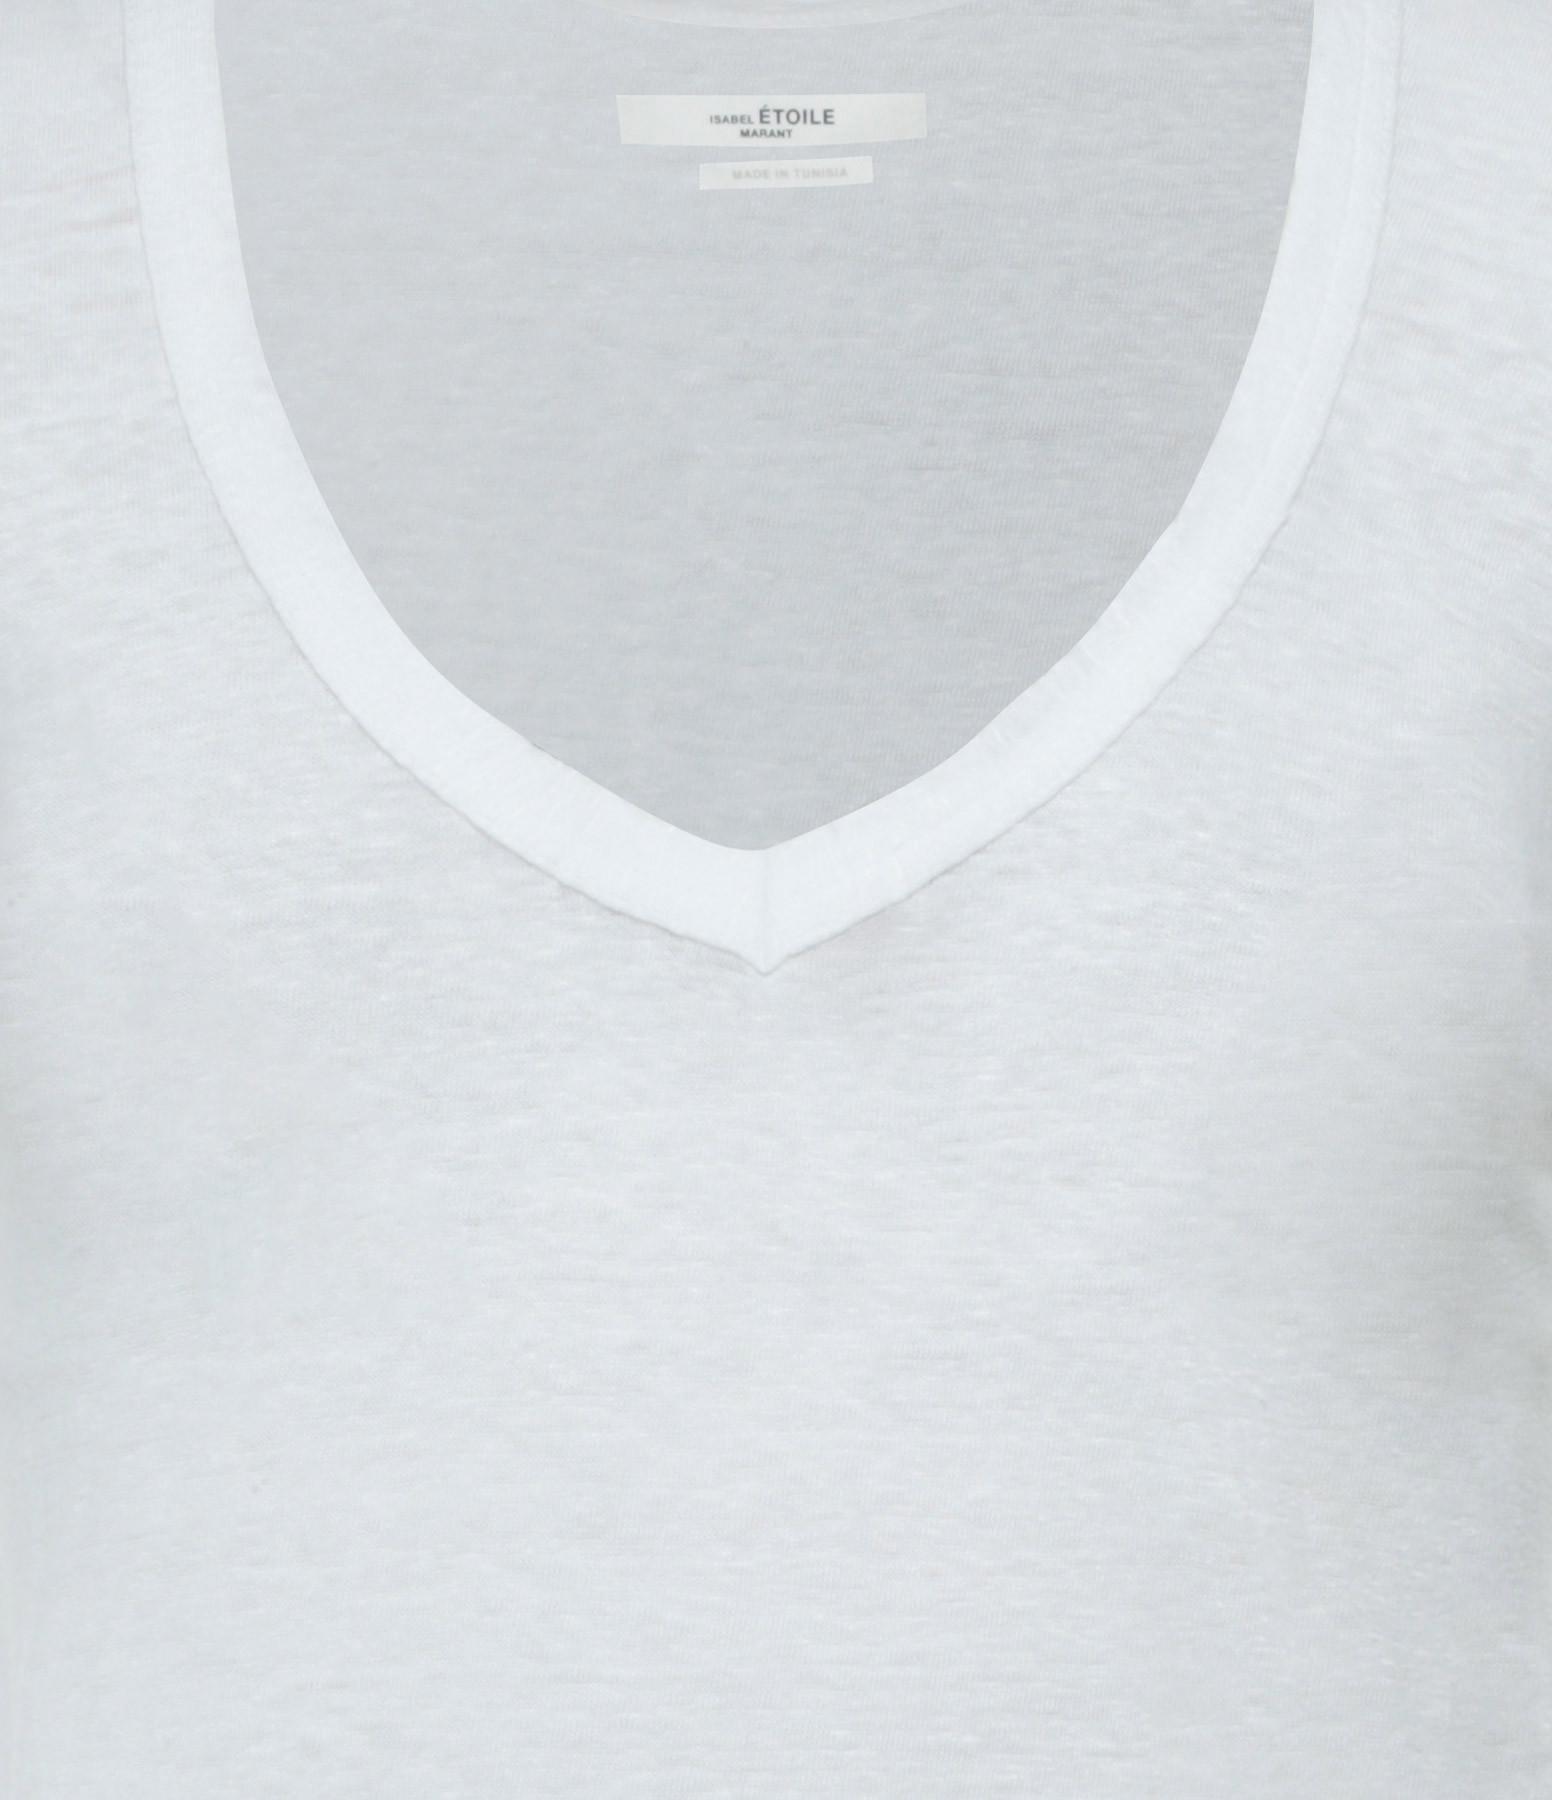 ISABEL MARANT ÉTOILE - Tee-shirt Zankou Lin Blanc